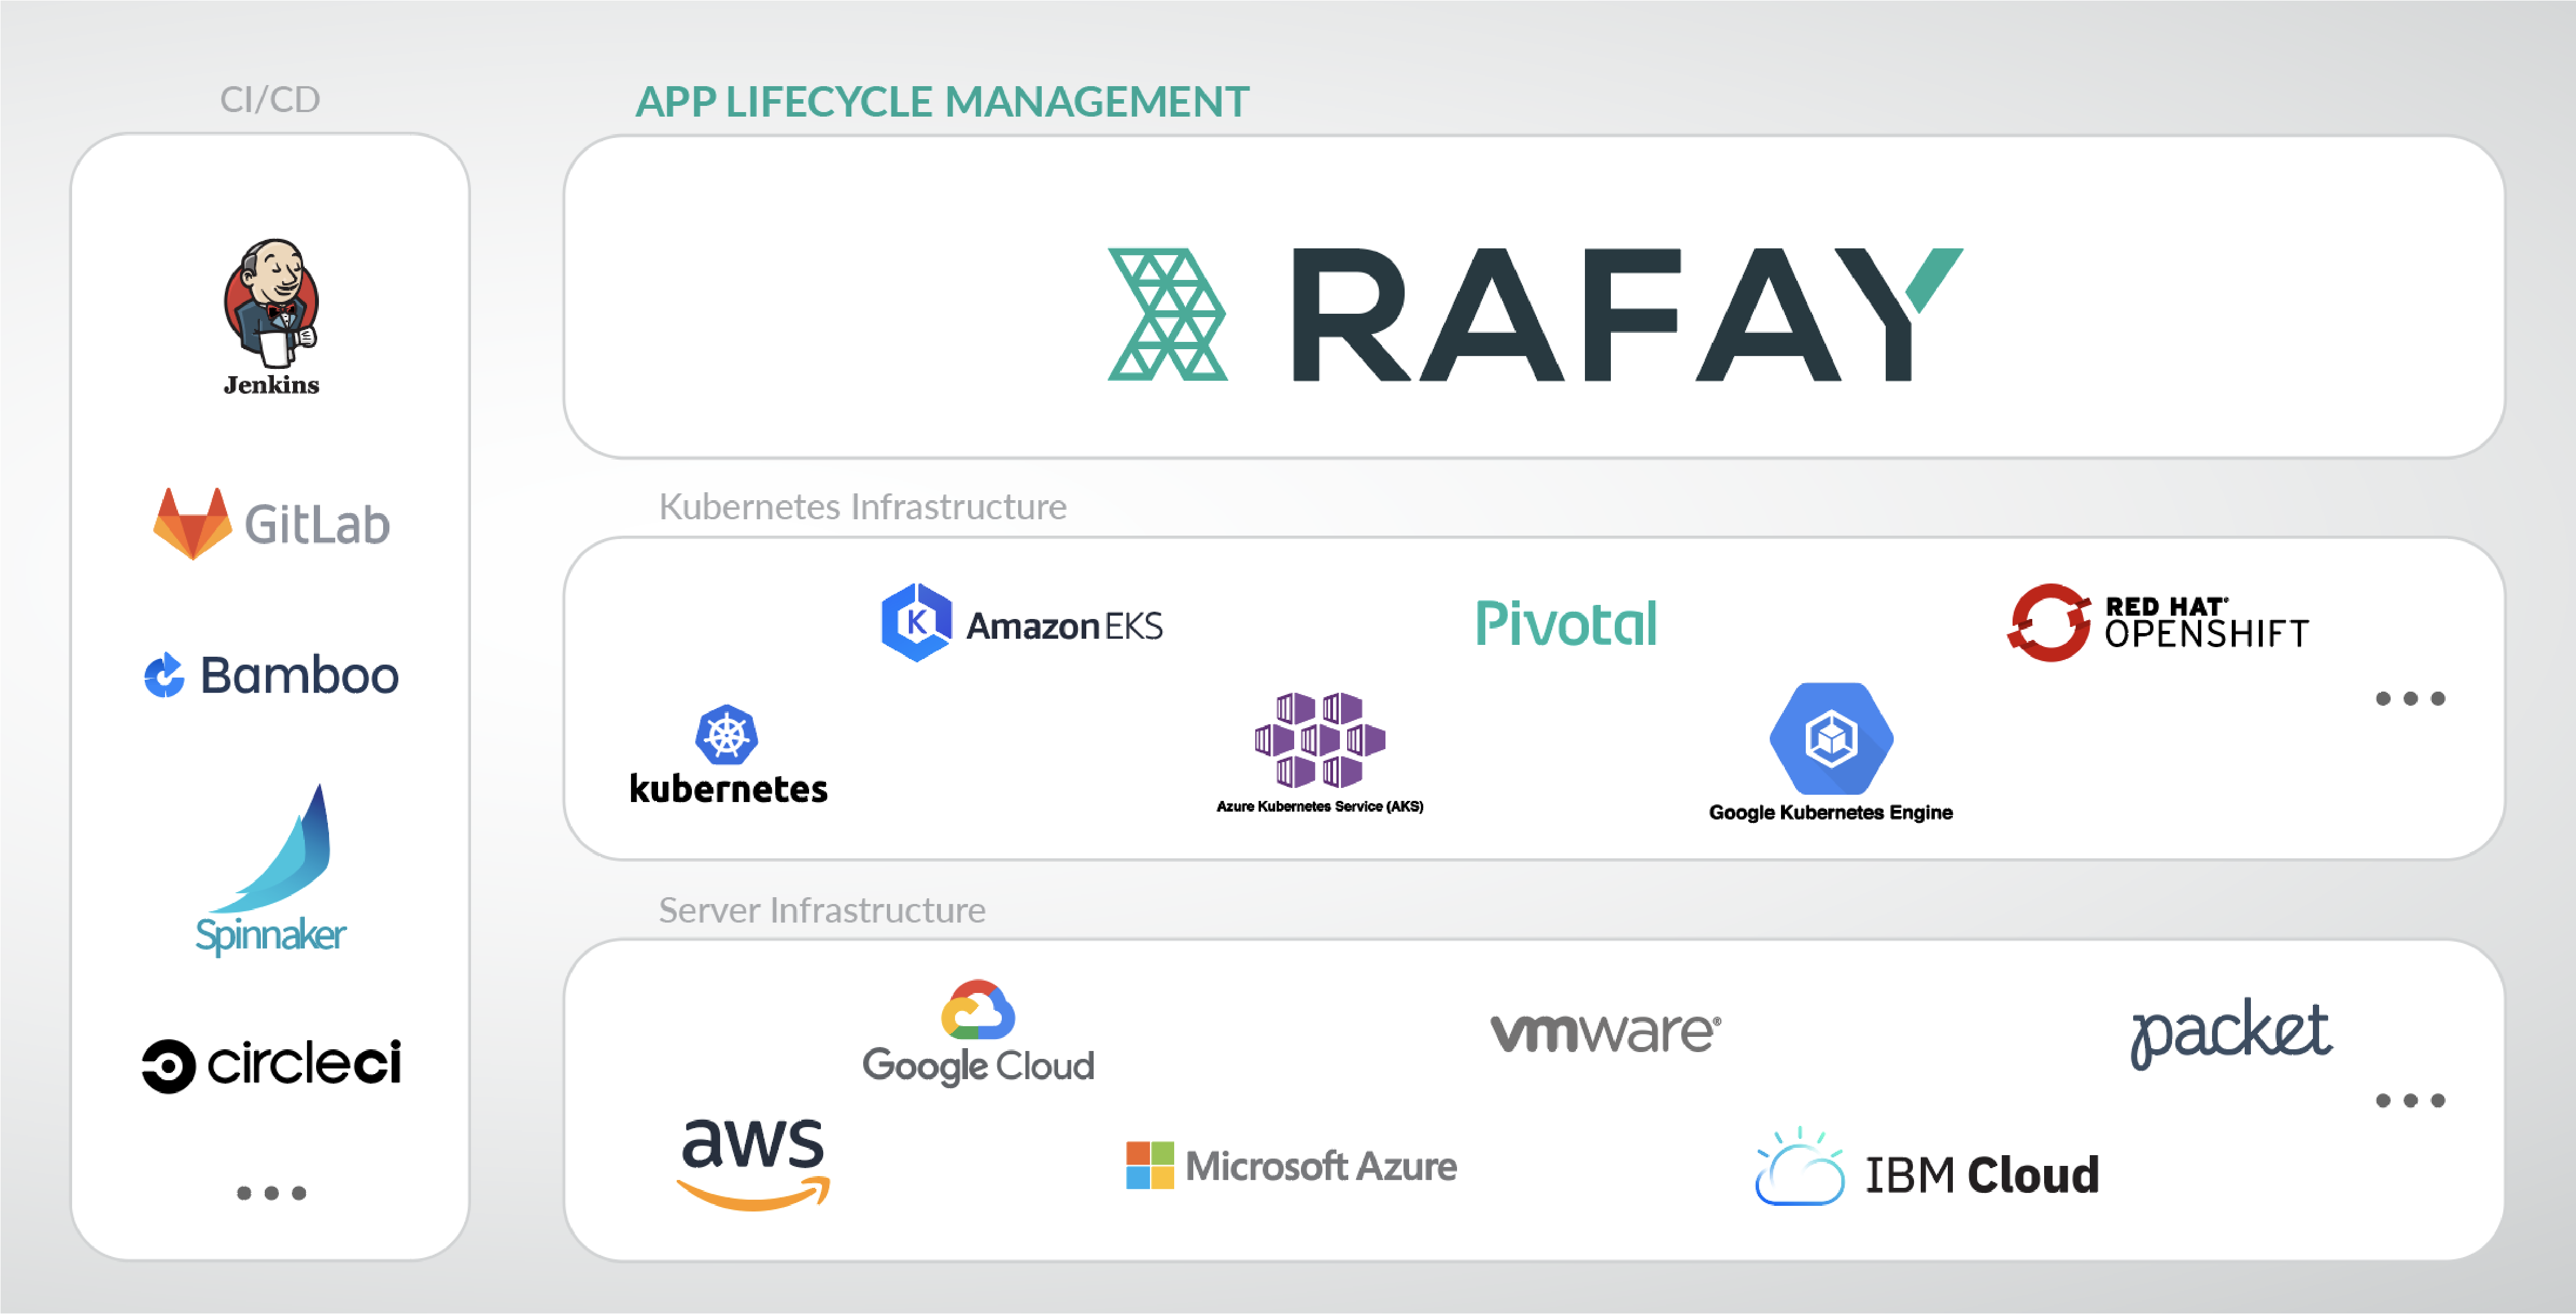 Rafay App Lifecycle Mgmt